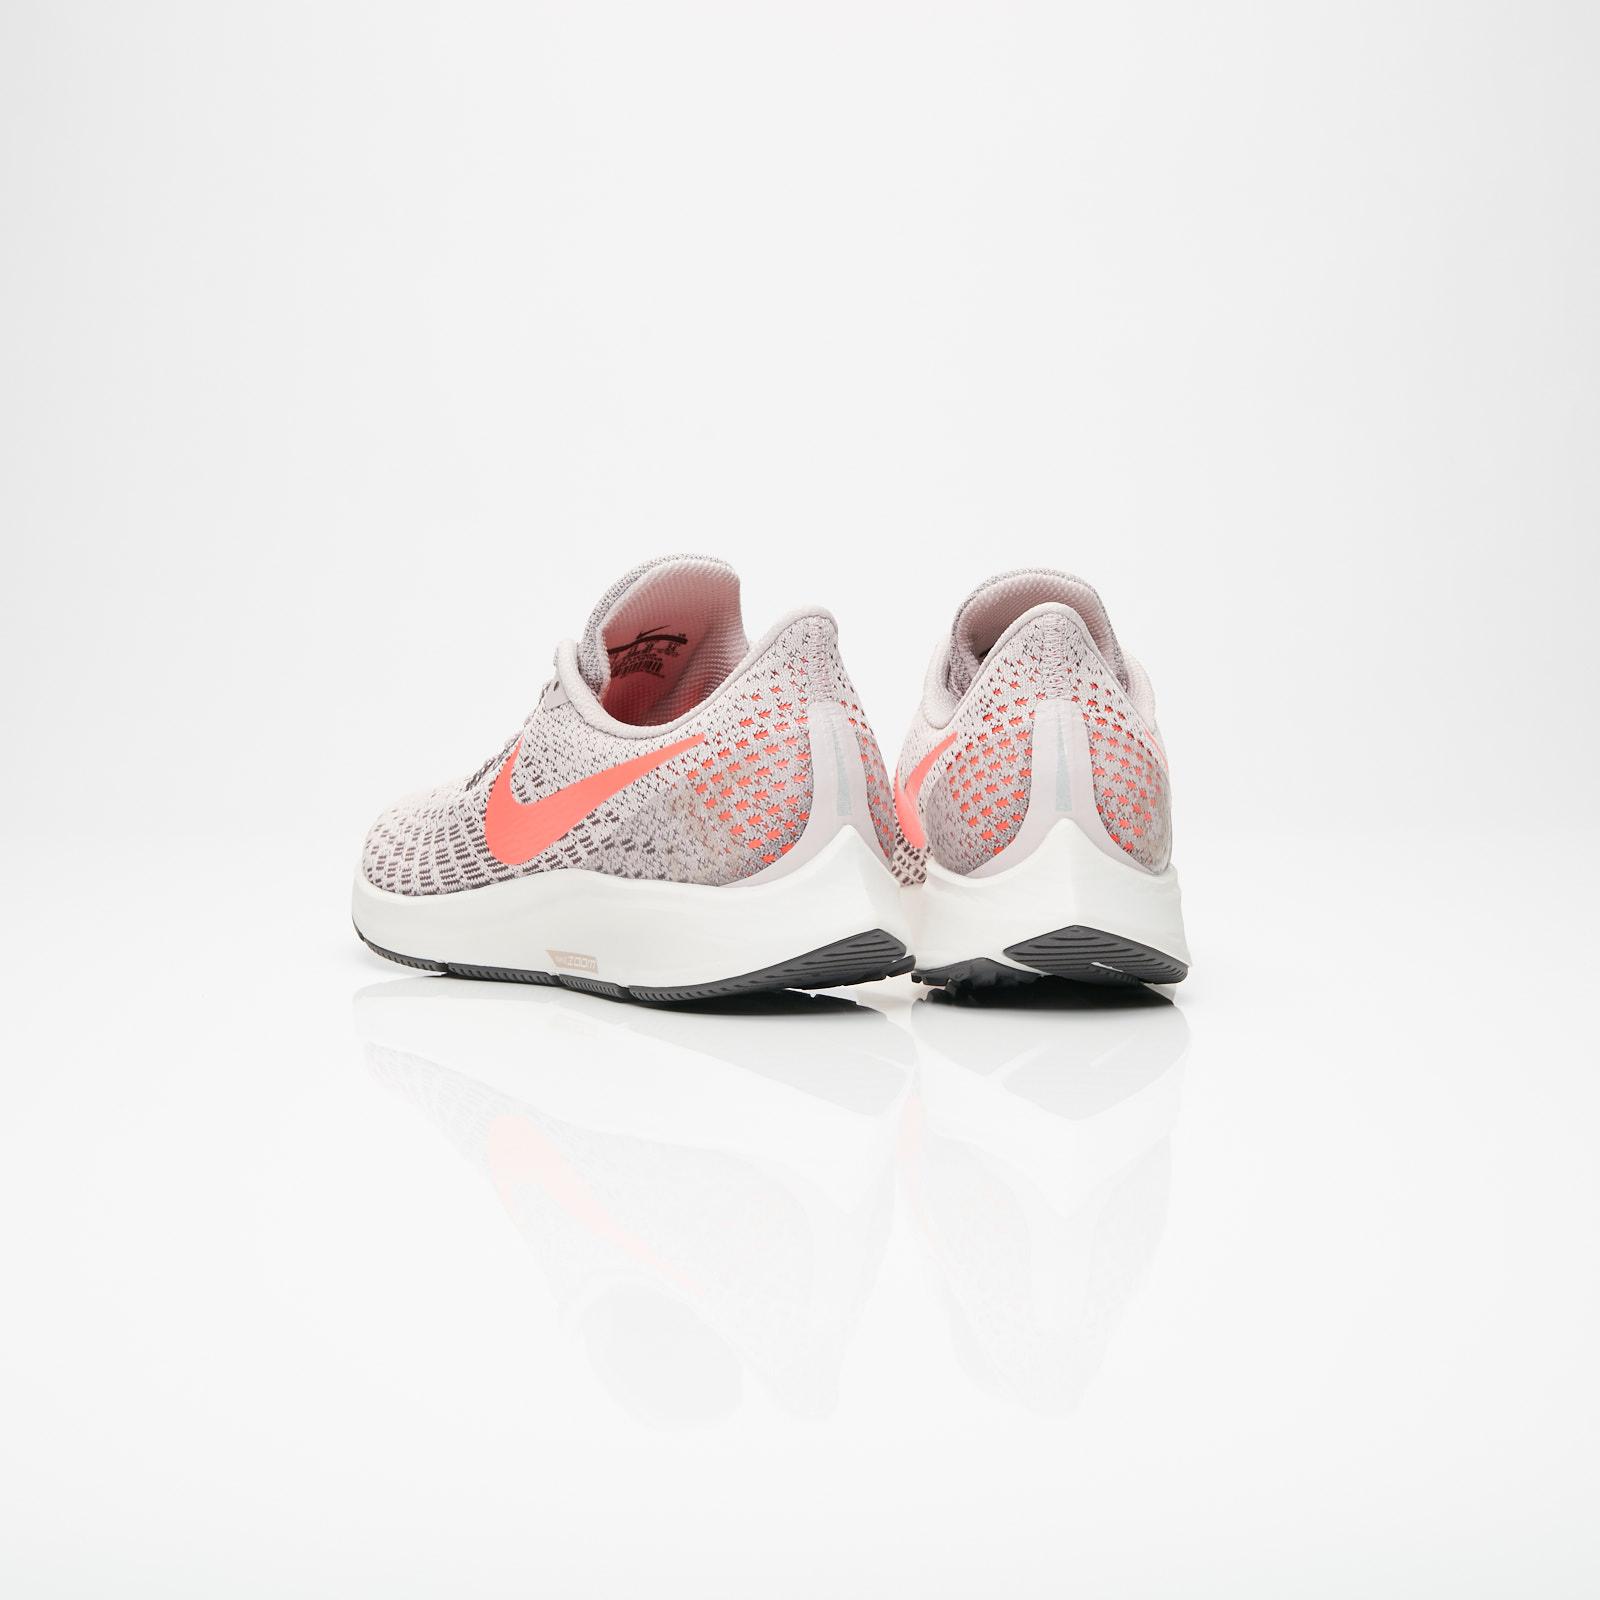 4e876d76f506e Nike Air Zoom Pegasus 35 - 942855-602 - Sneakersnstuff